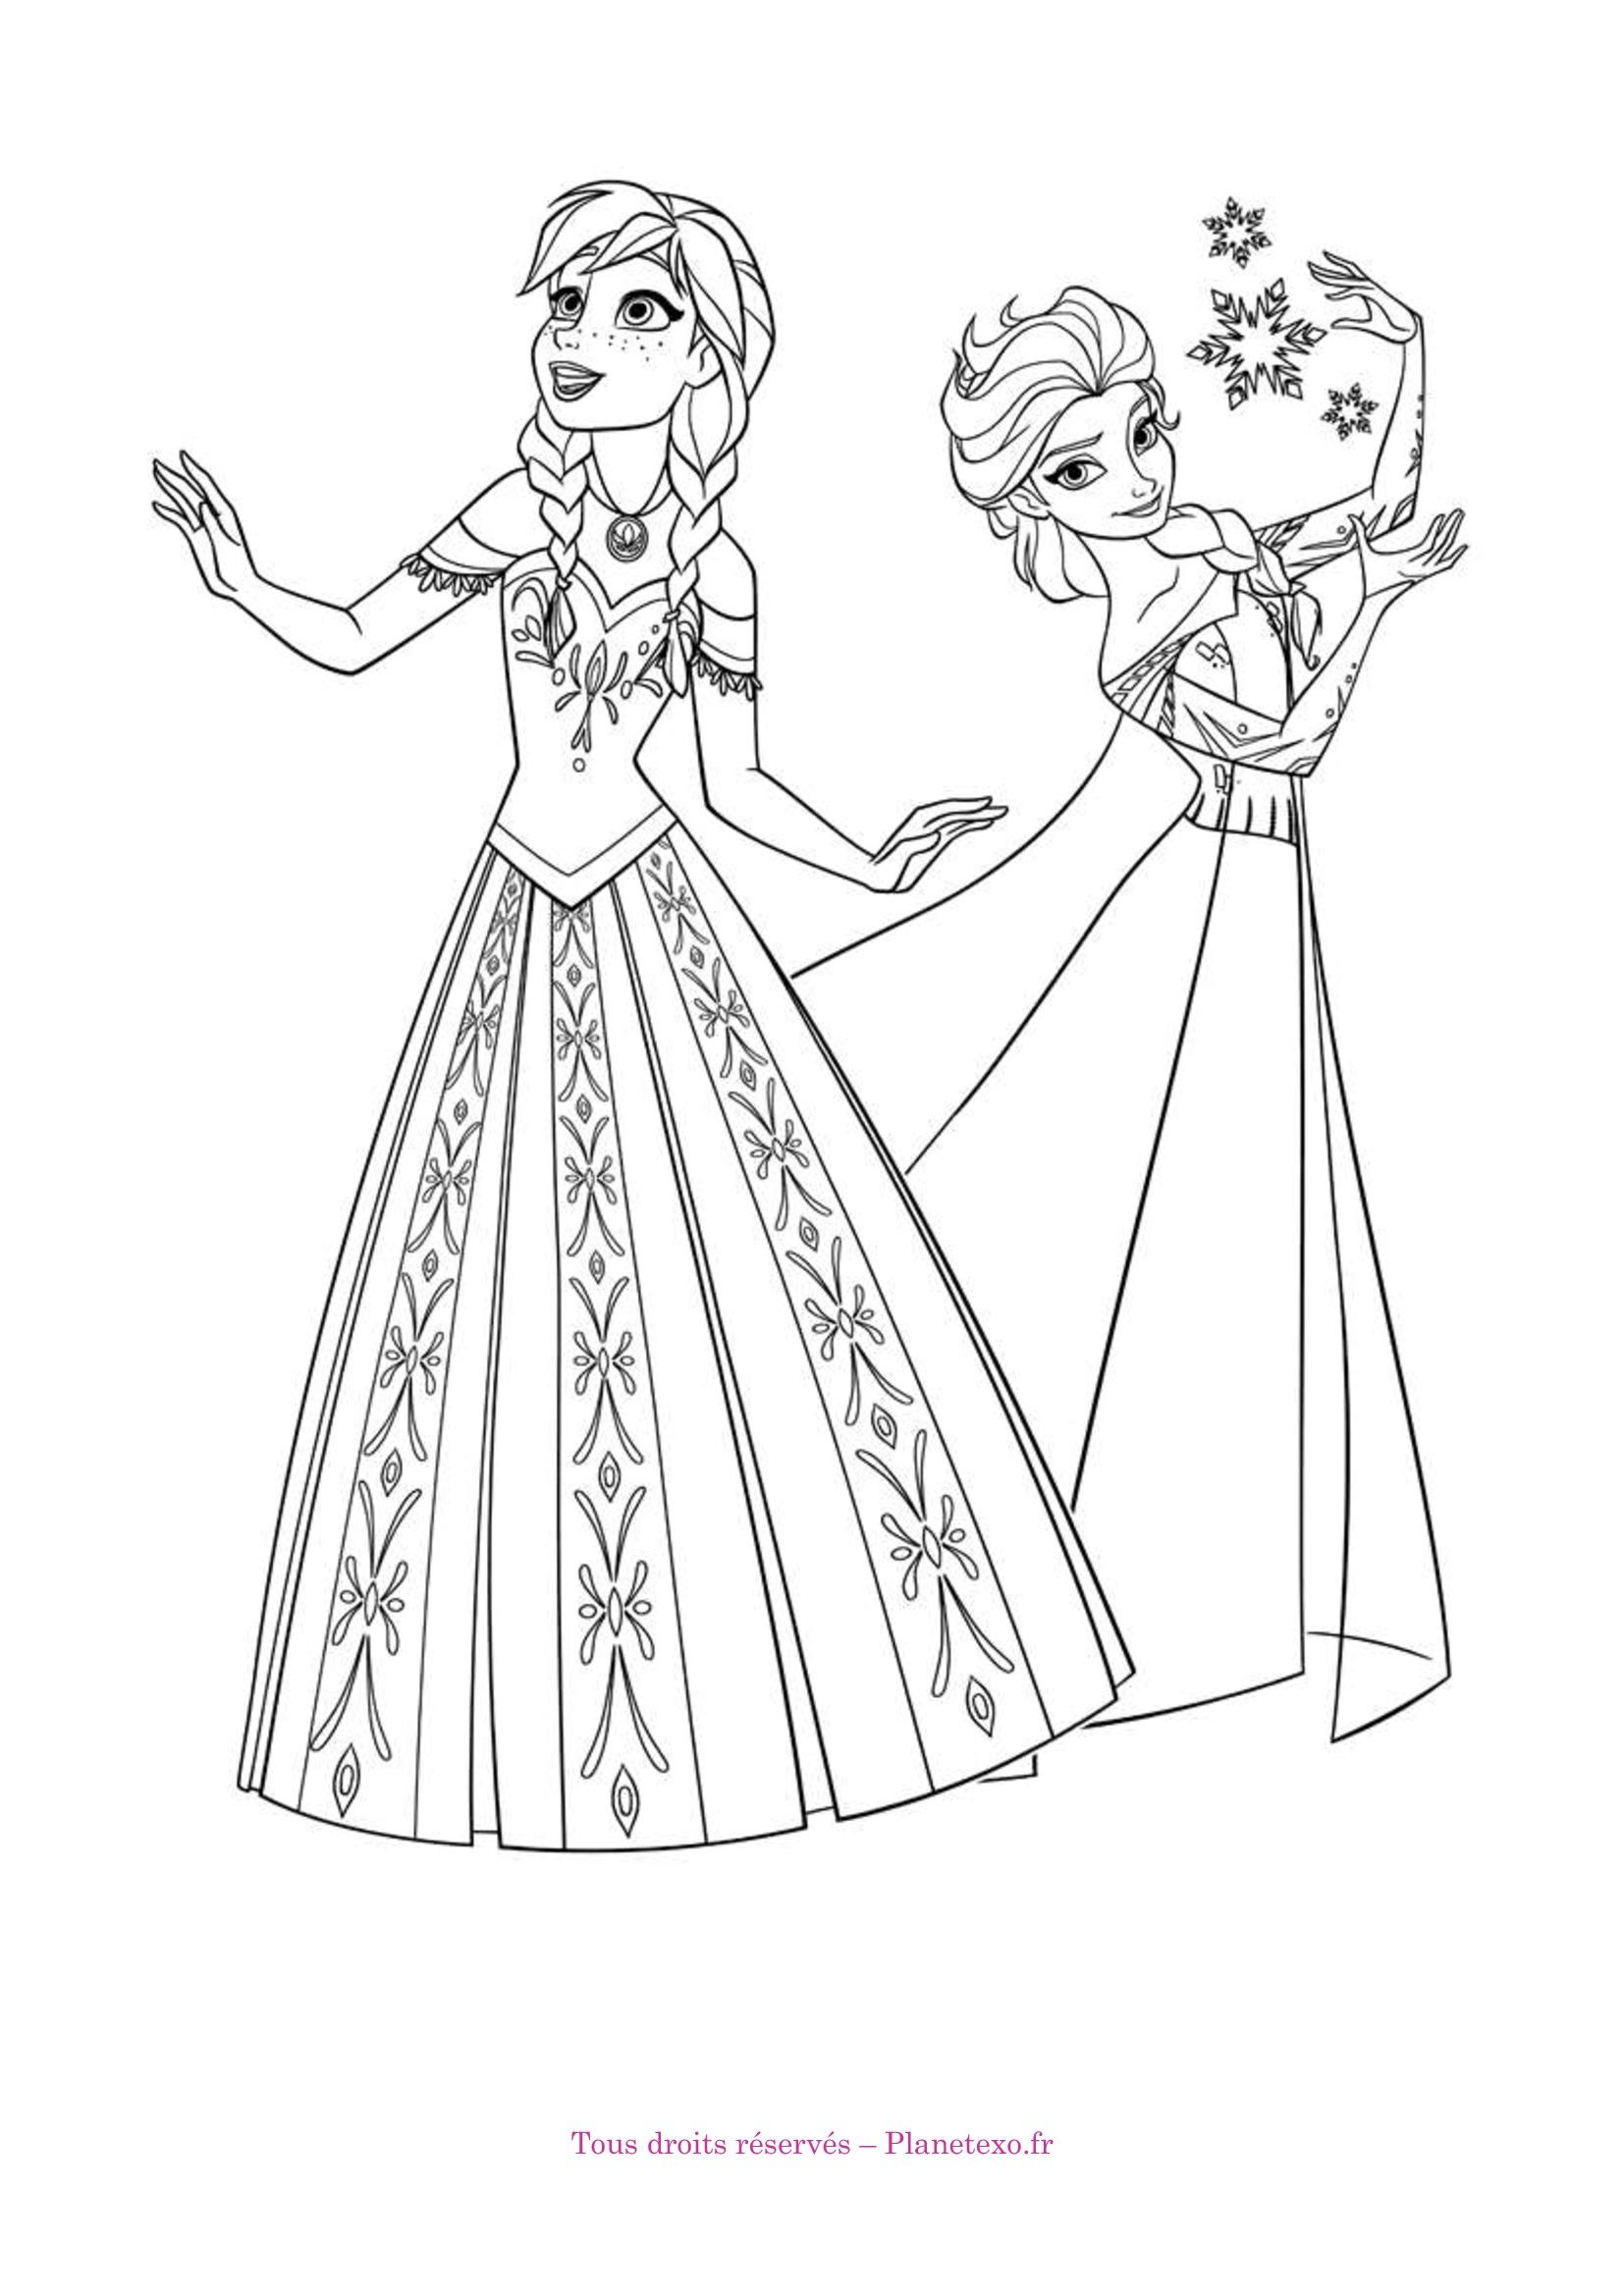 144 Dibujos De Disney Frozen Para Colorear Oh Kids Page 5e